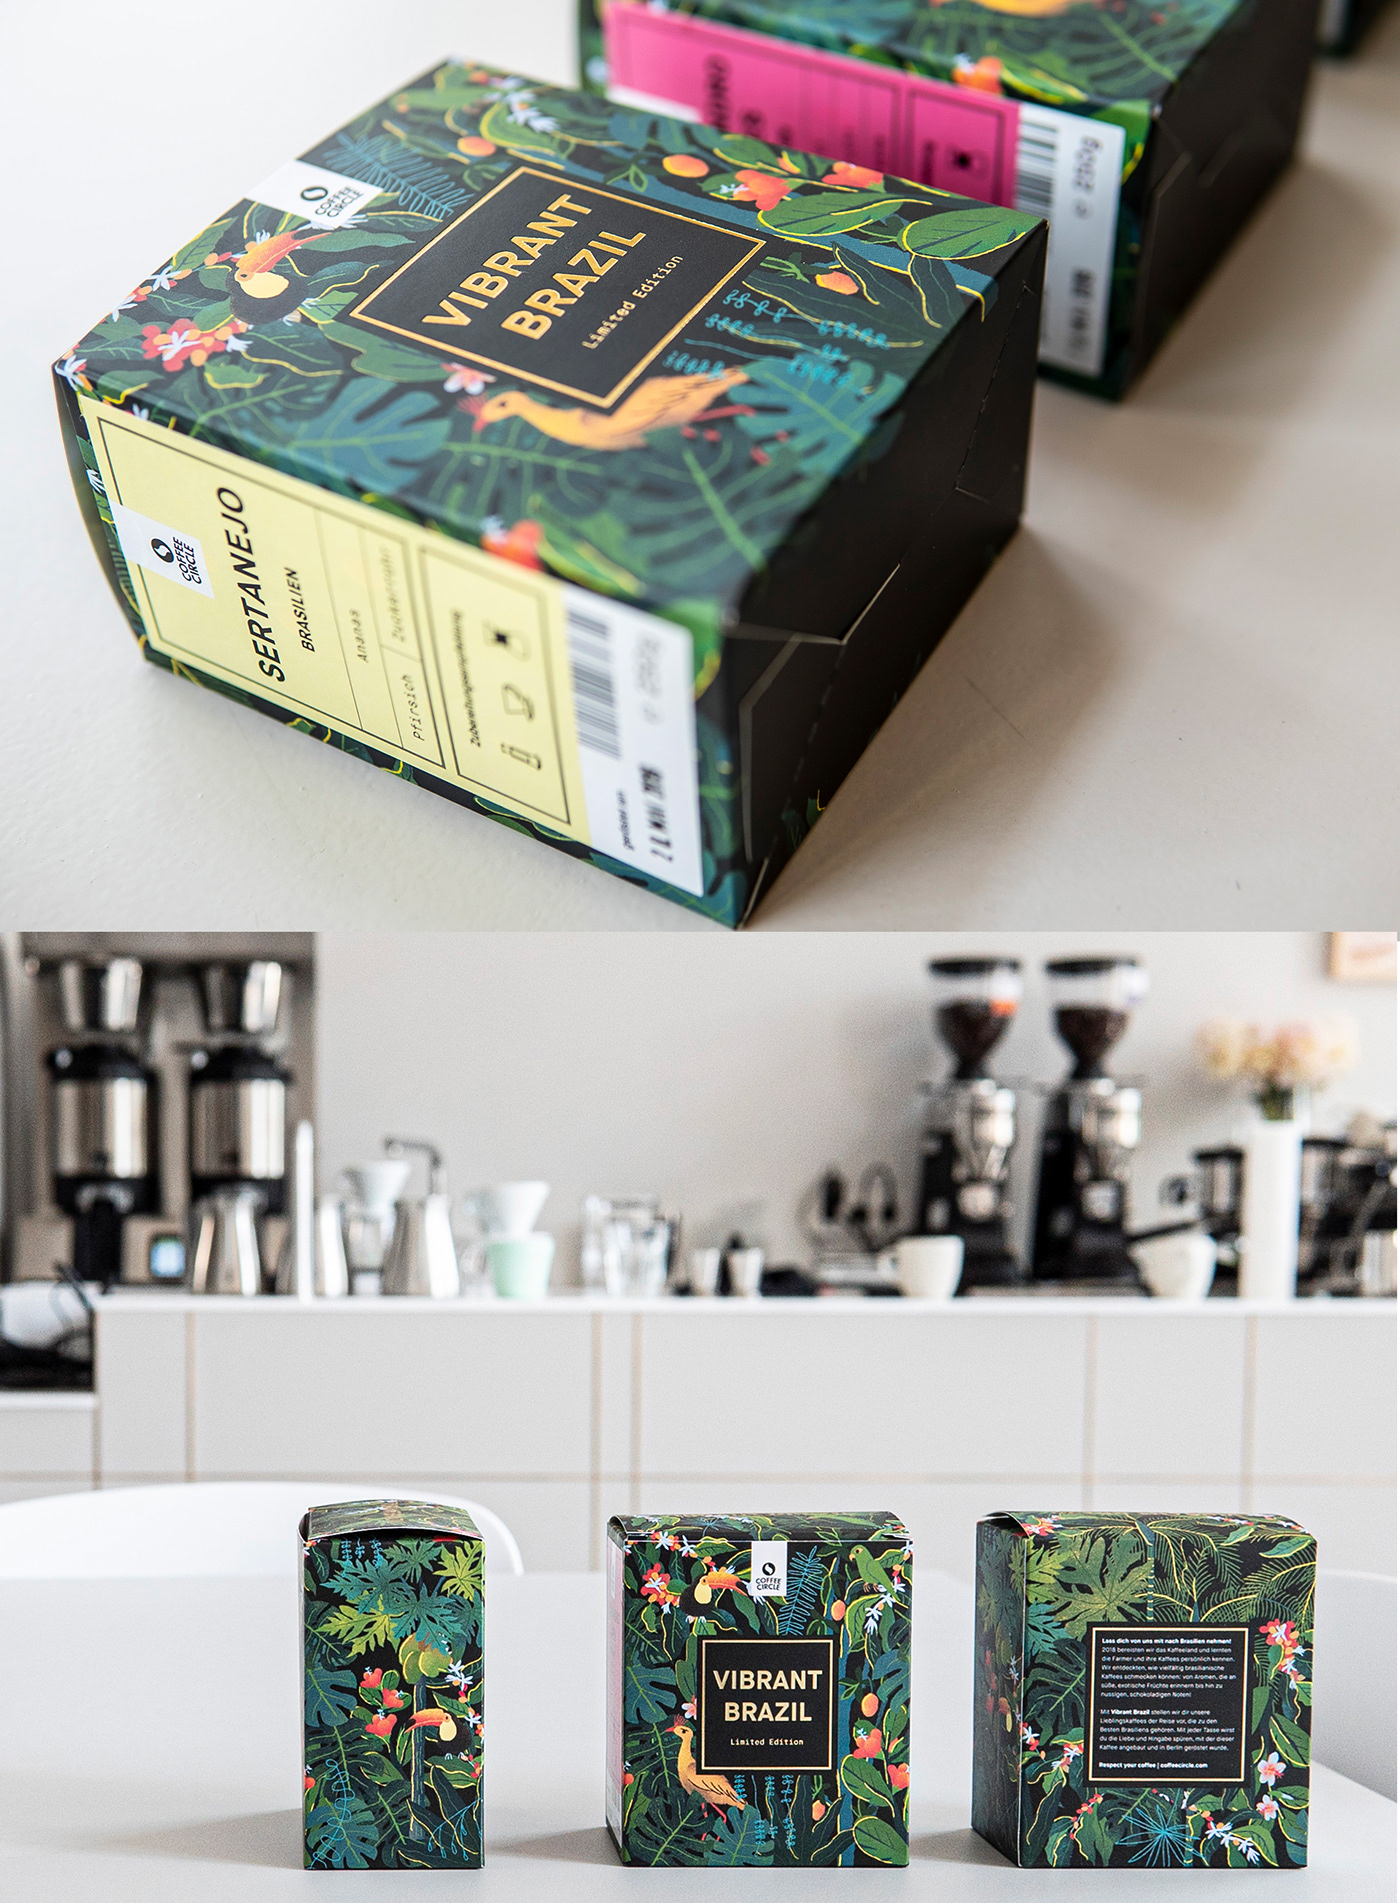 Coffee Brazil coffee circle berlin package Aslin Yuheng lin jungel vibrant brazil ILLUSTRATION